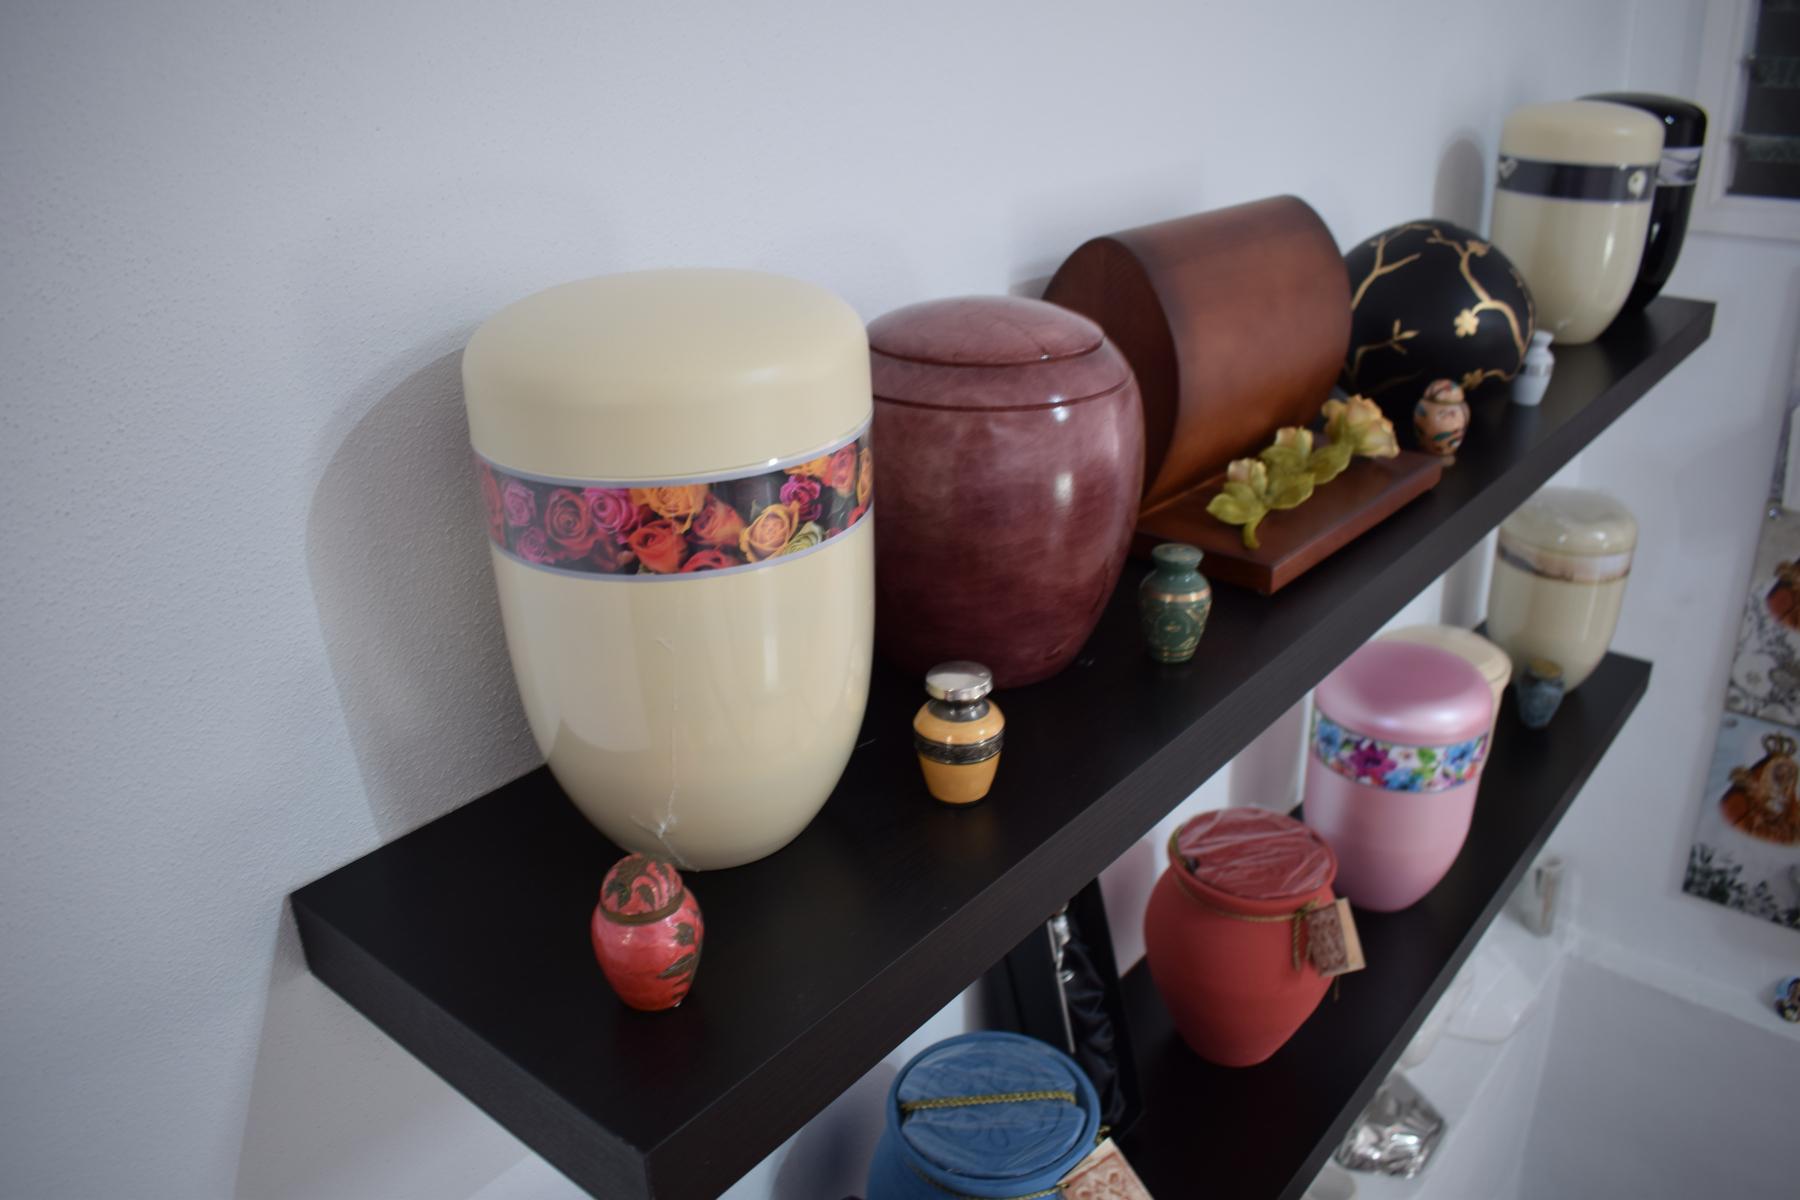 Urnas para incineracion o cremacion Funeraria Icod Torano